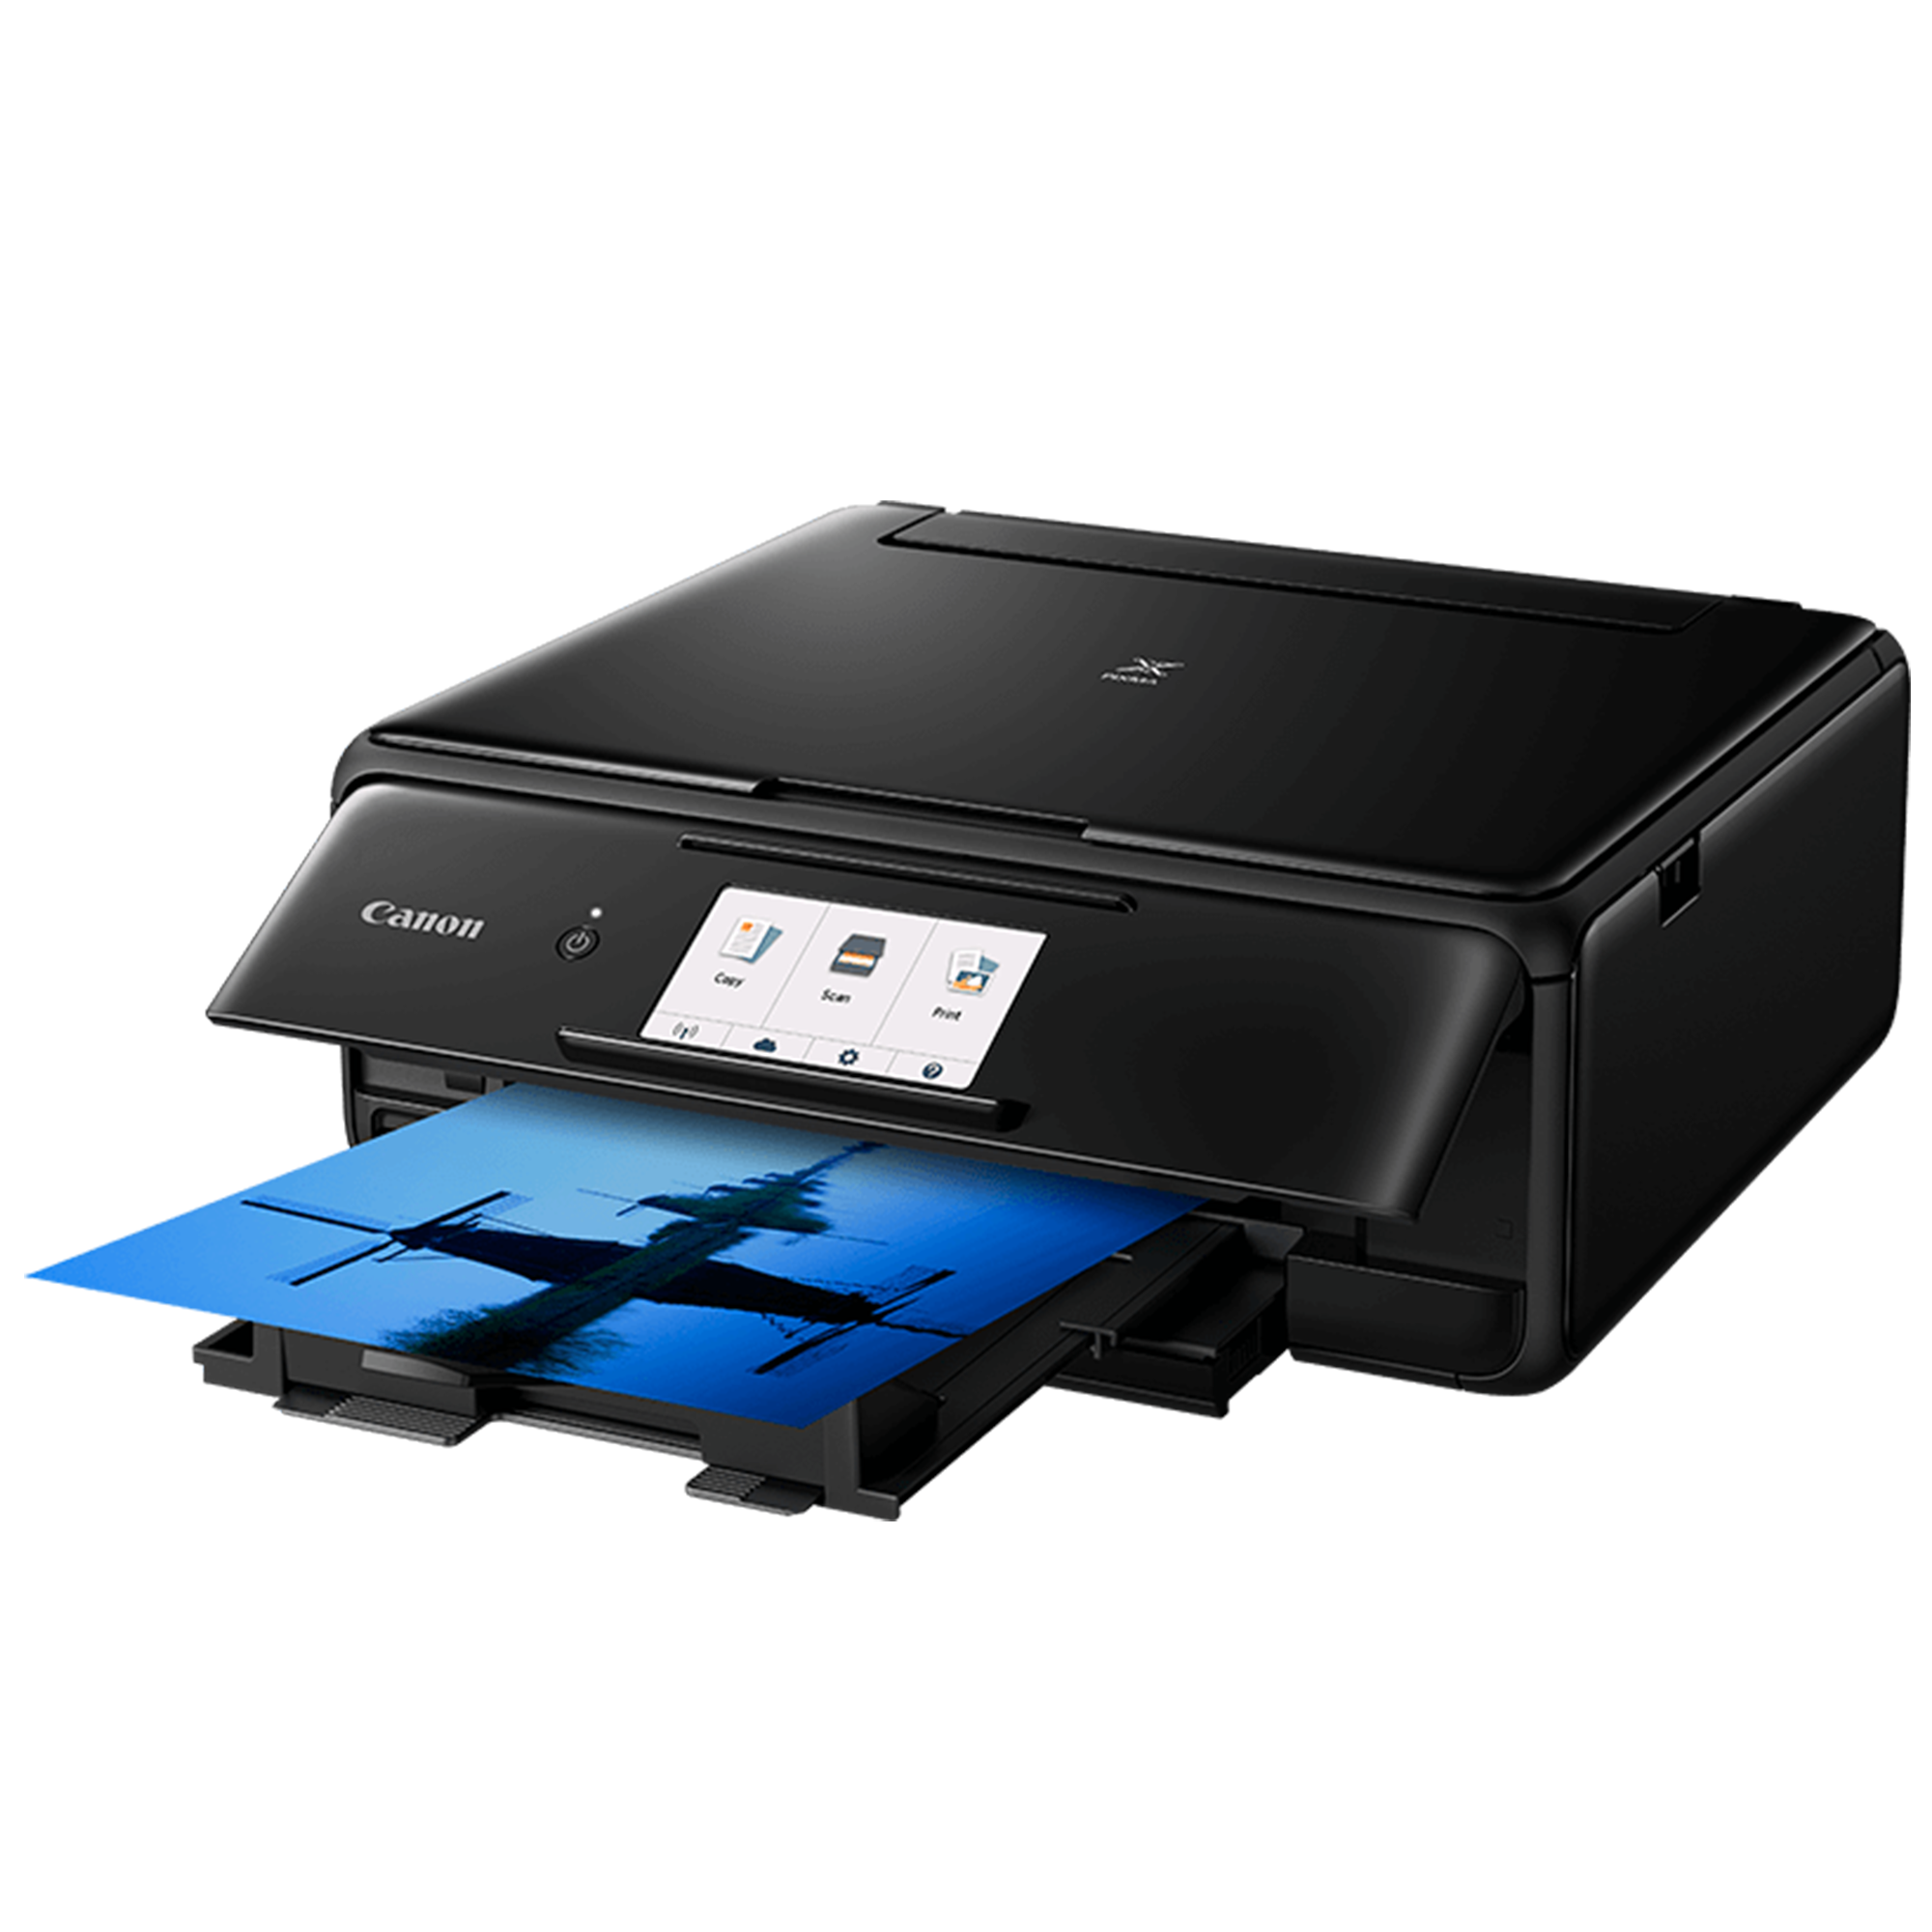 Canon PIXMA TS8140 Inkjet Printer